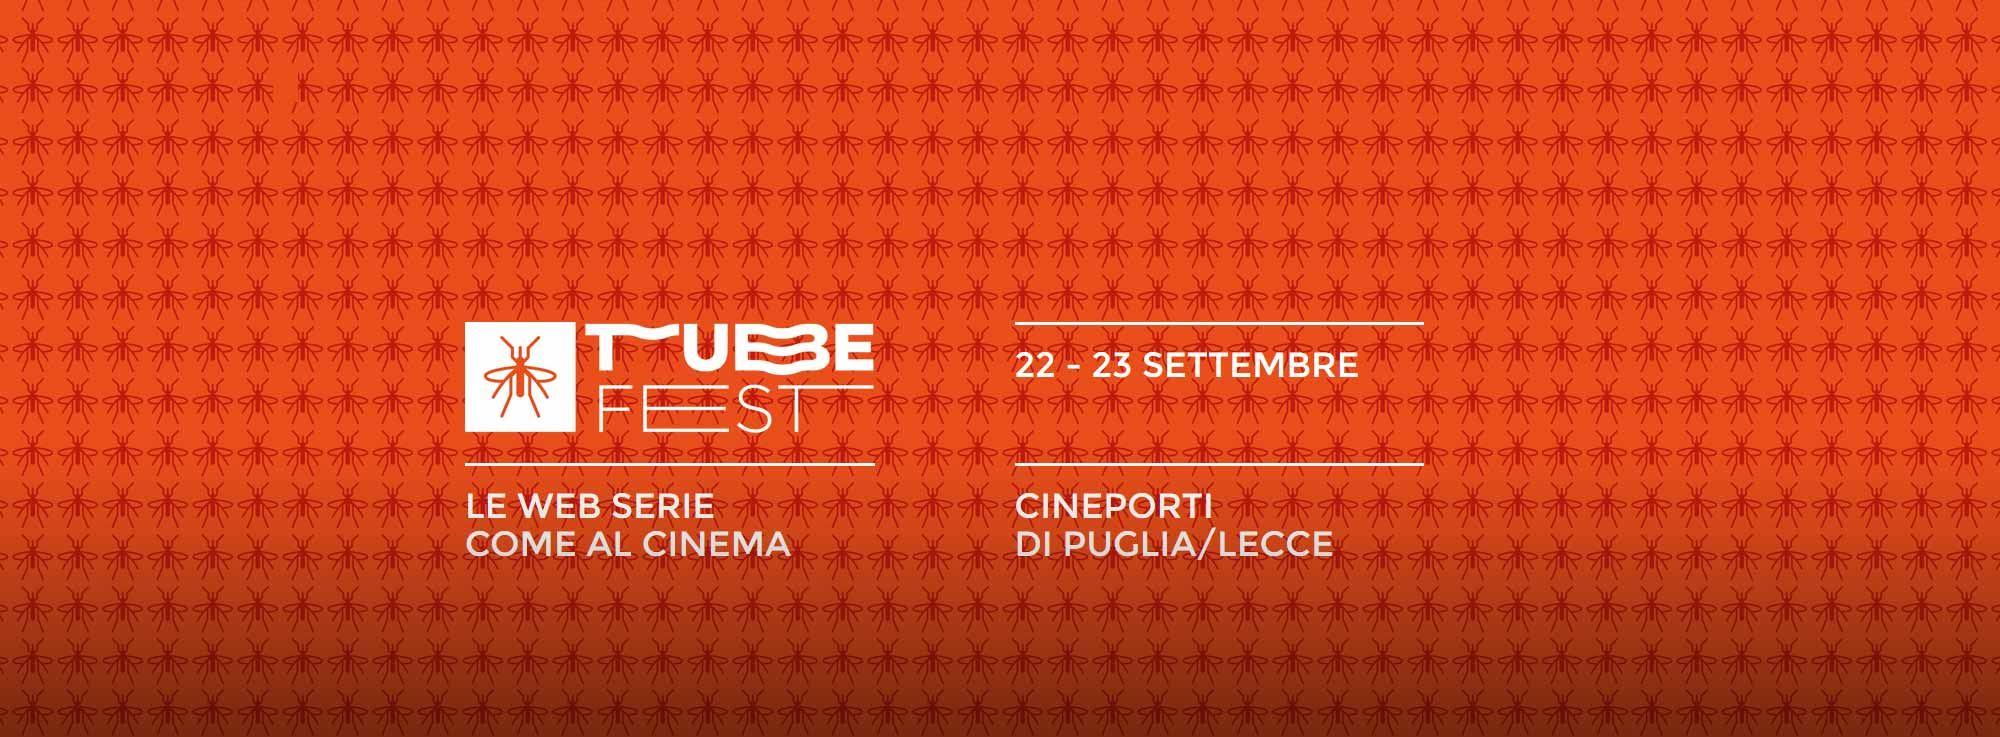 Lecce: Tube Fest